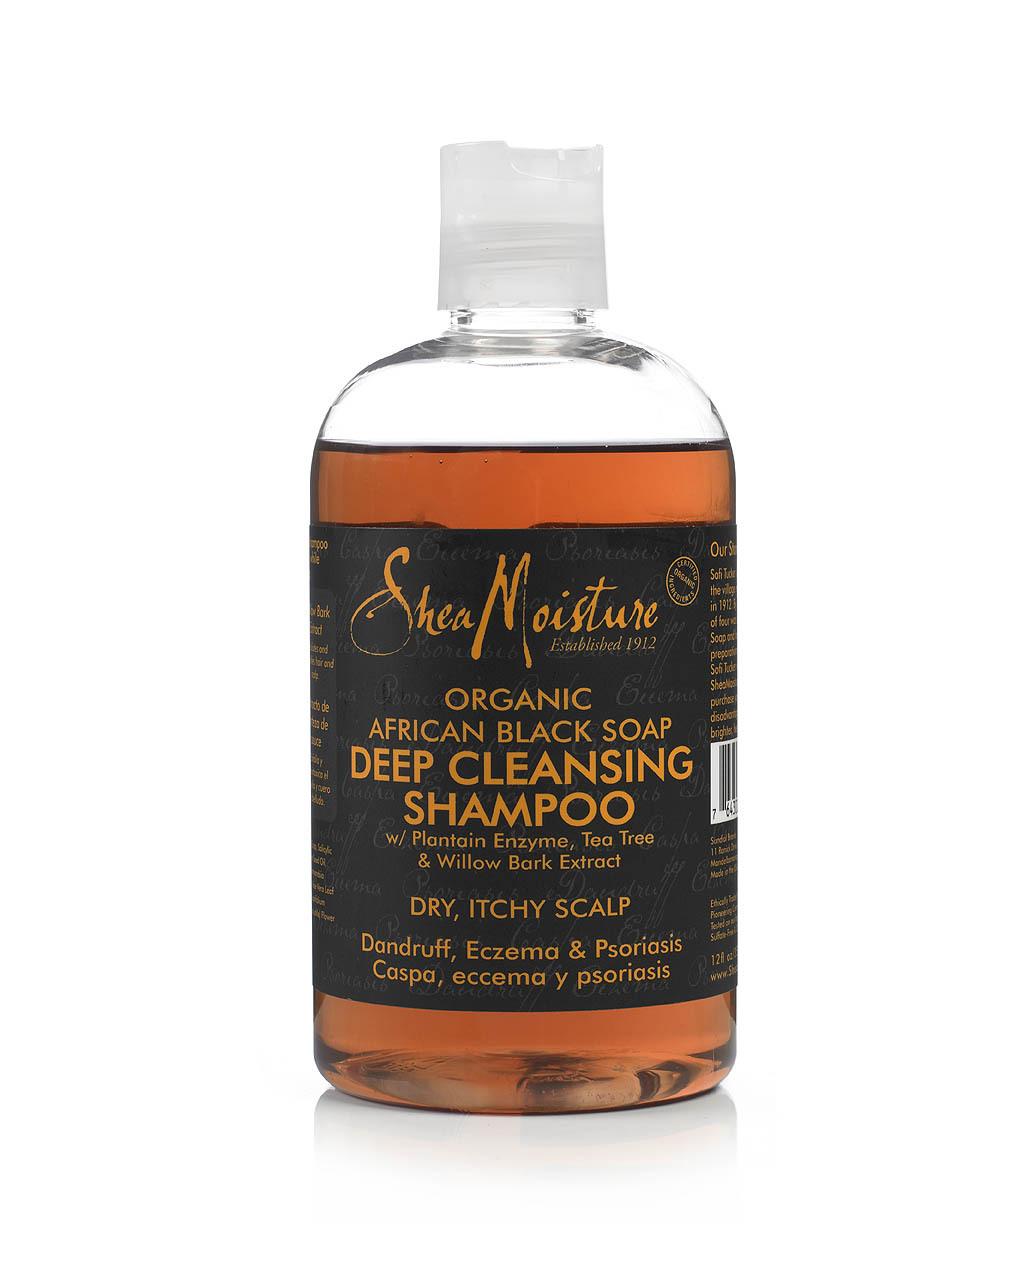 Shea Moisture African Black Soap organic Shampoing de nettoyage en profondeur 355ml